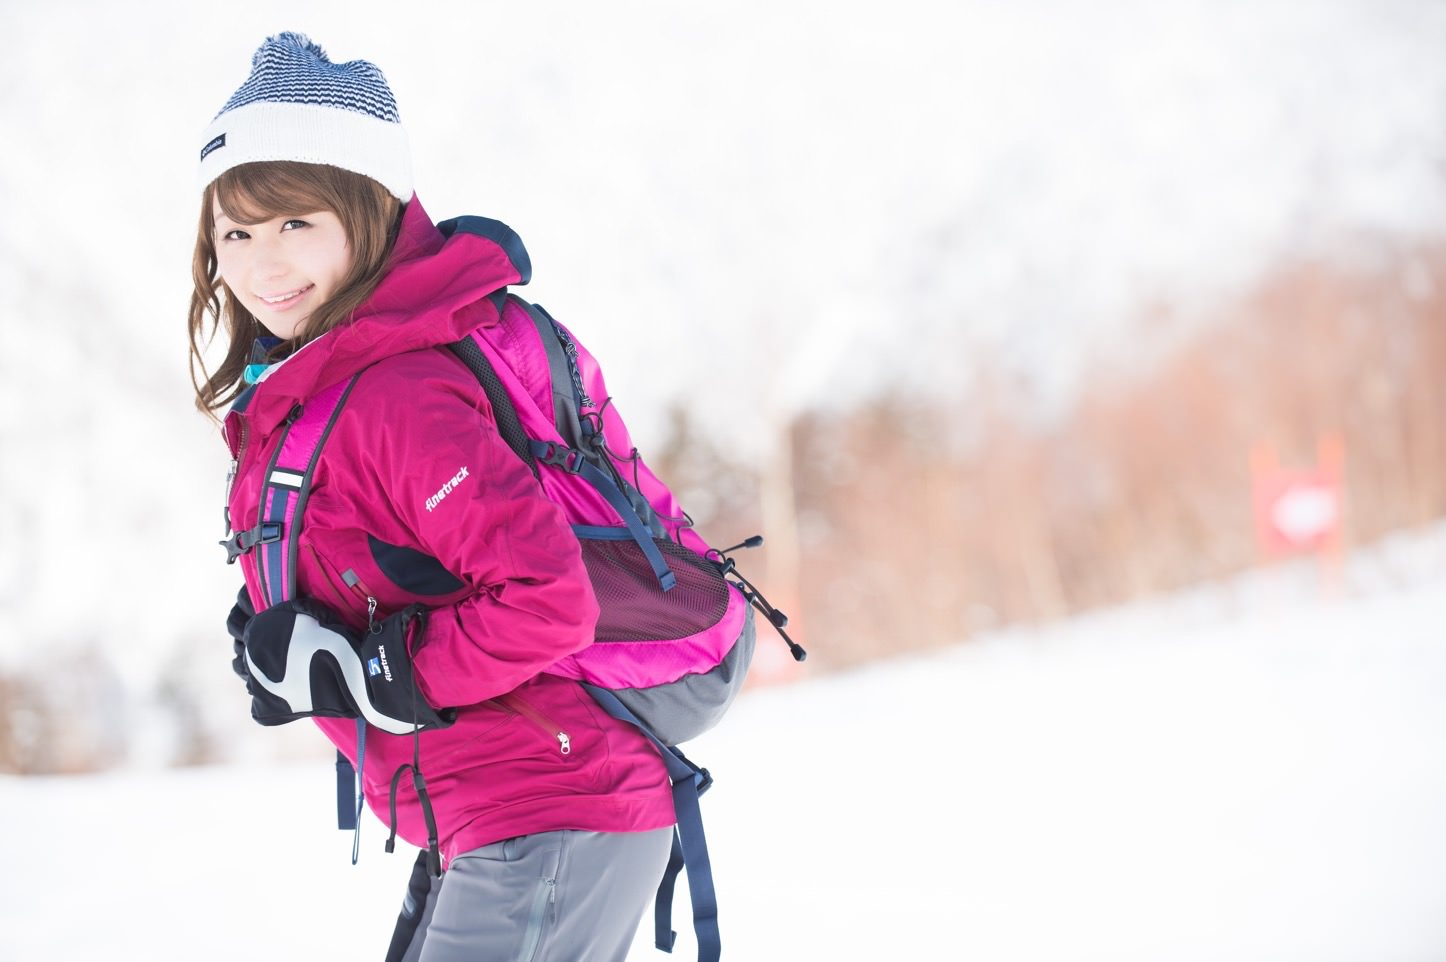 Akane-Saya-in-Hirayu-Onsen-Winter-03.jpg